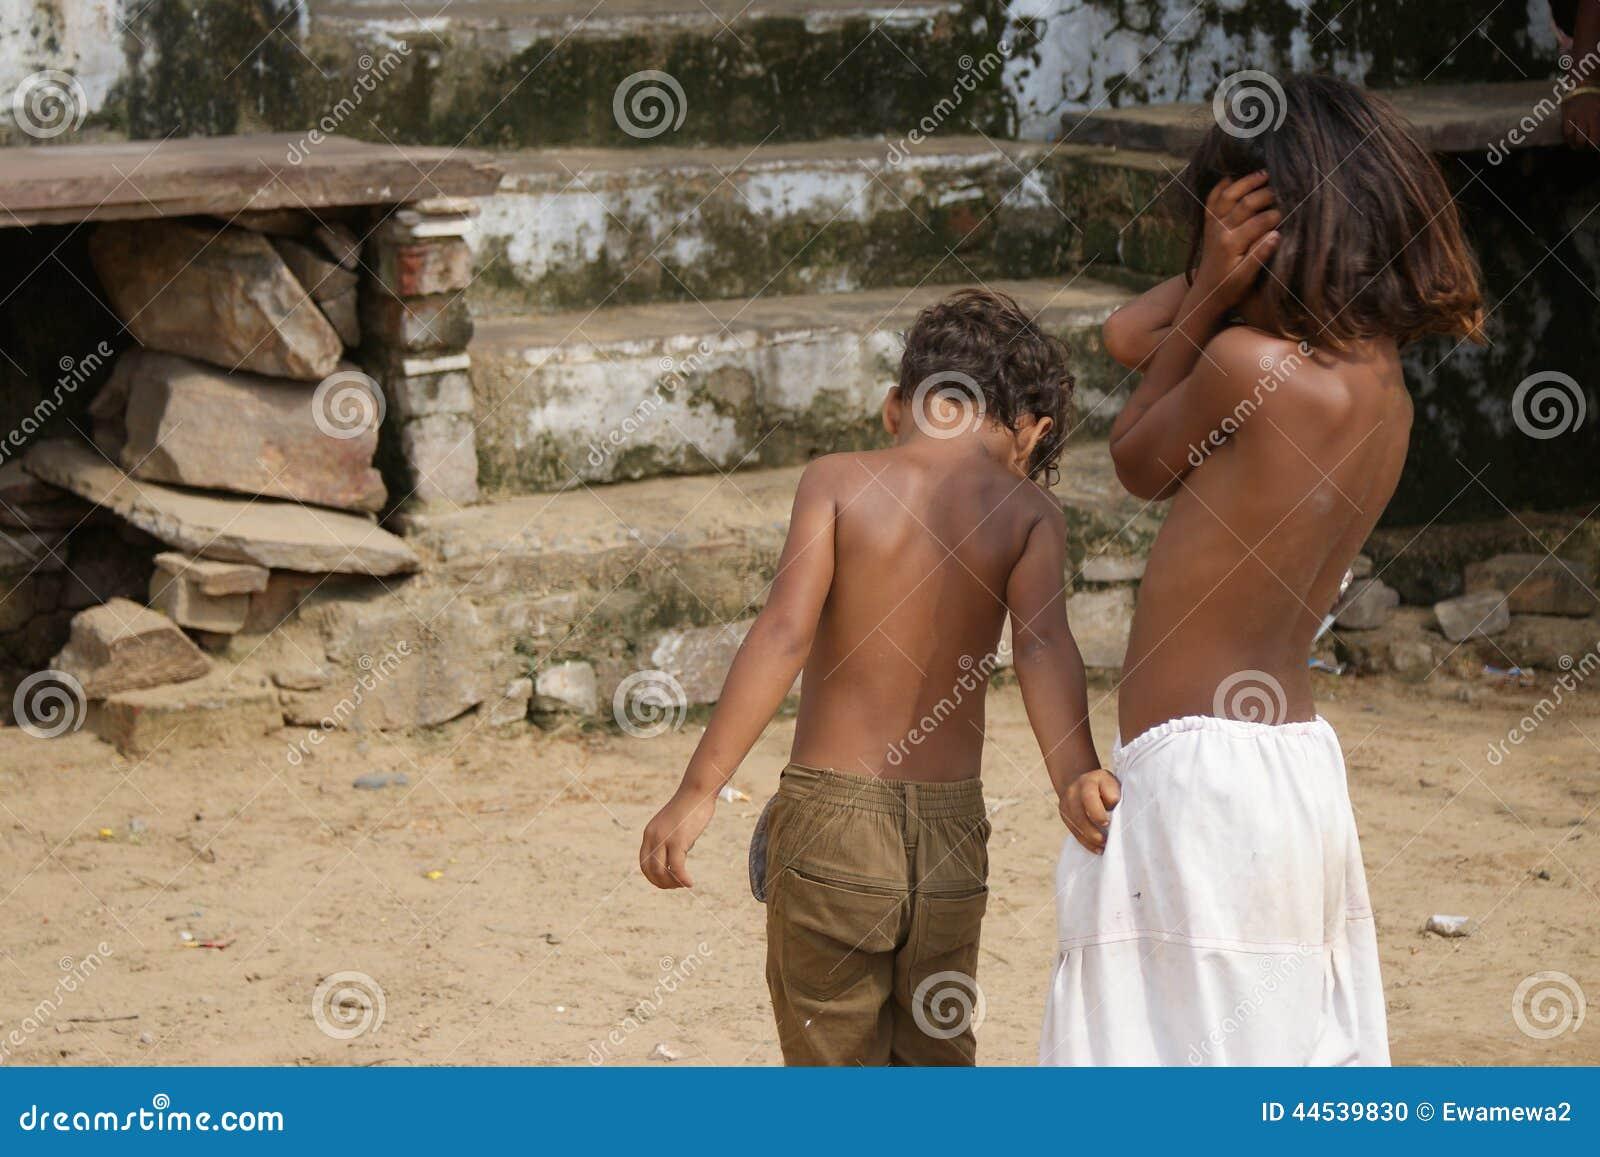 hindu girl fucking pics